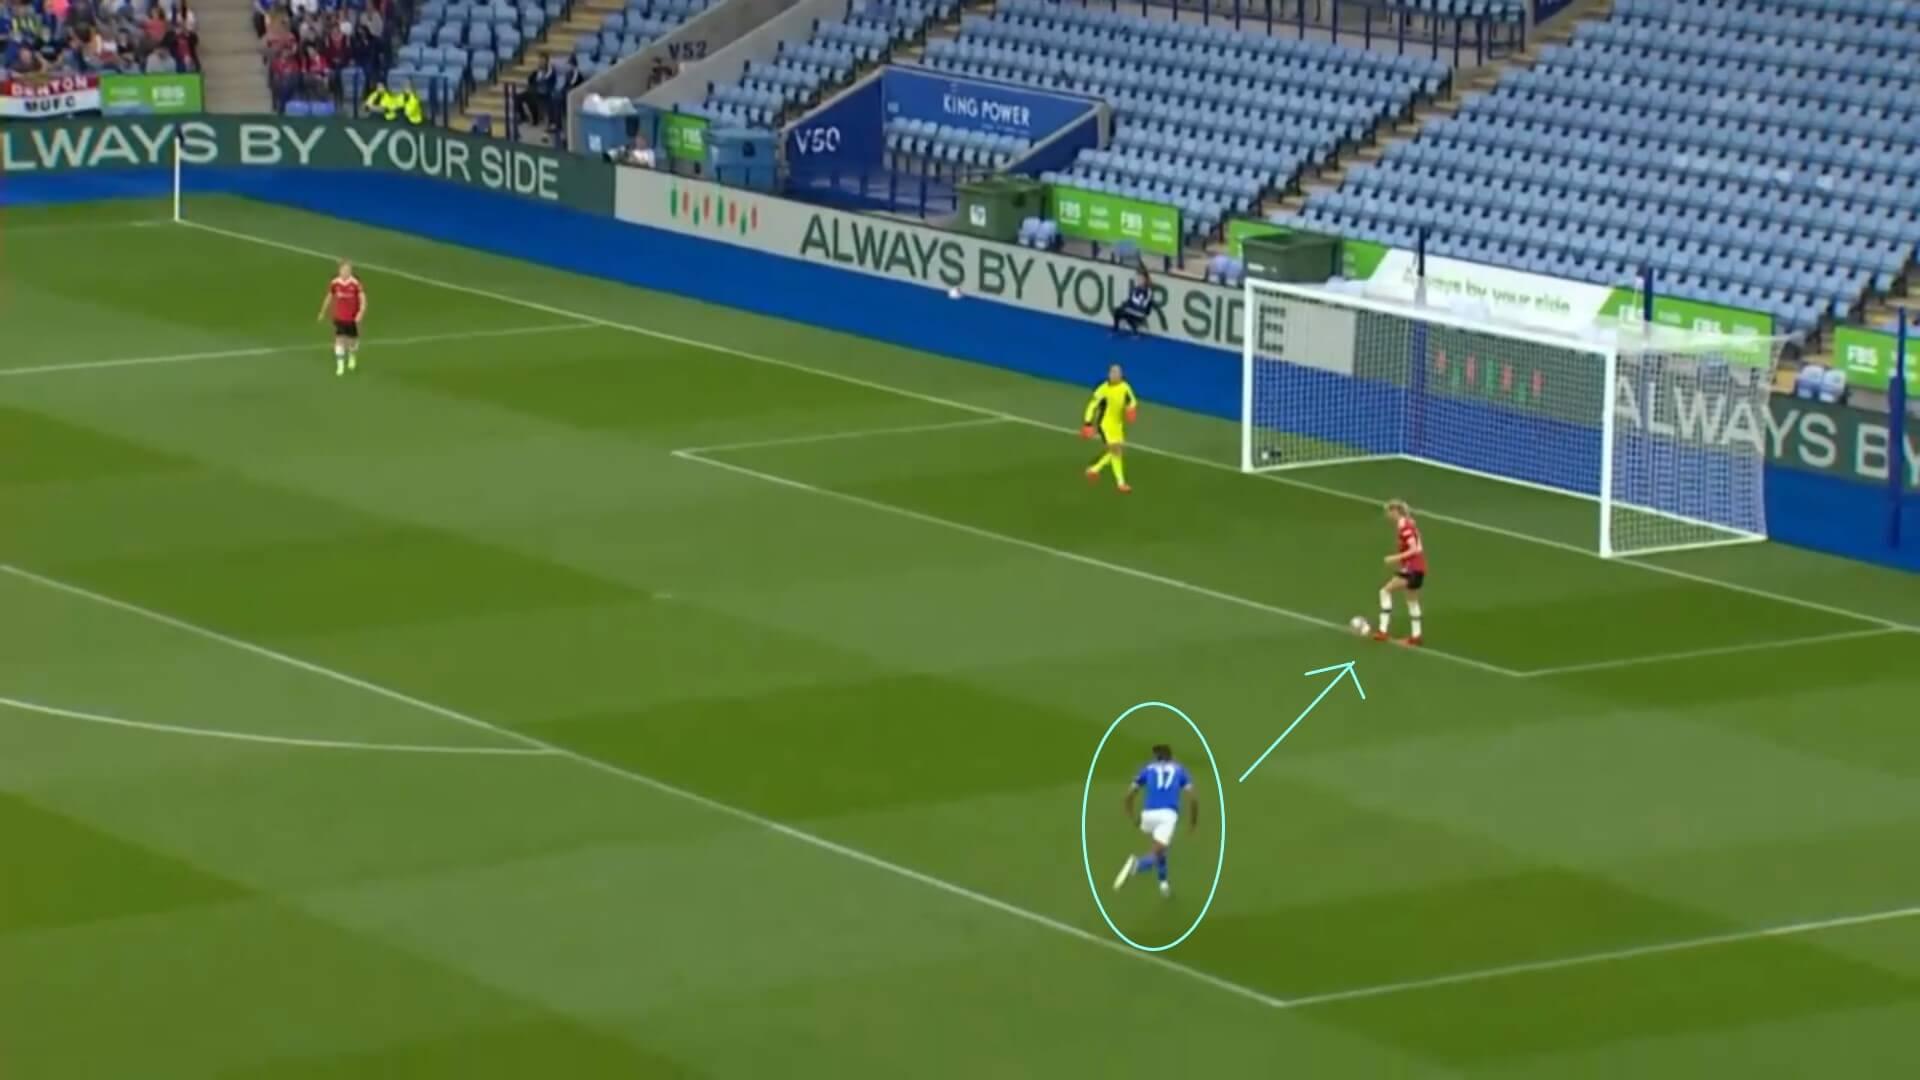 FAWSL 2021/2022: Leicester City Women v Manchester United Women - tactical analysis tactics